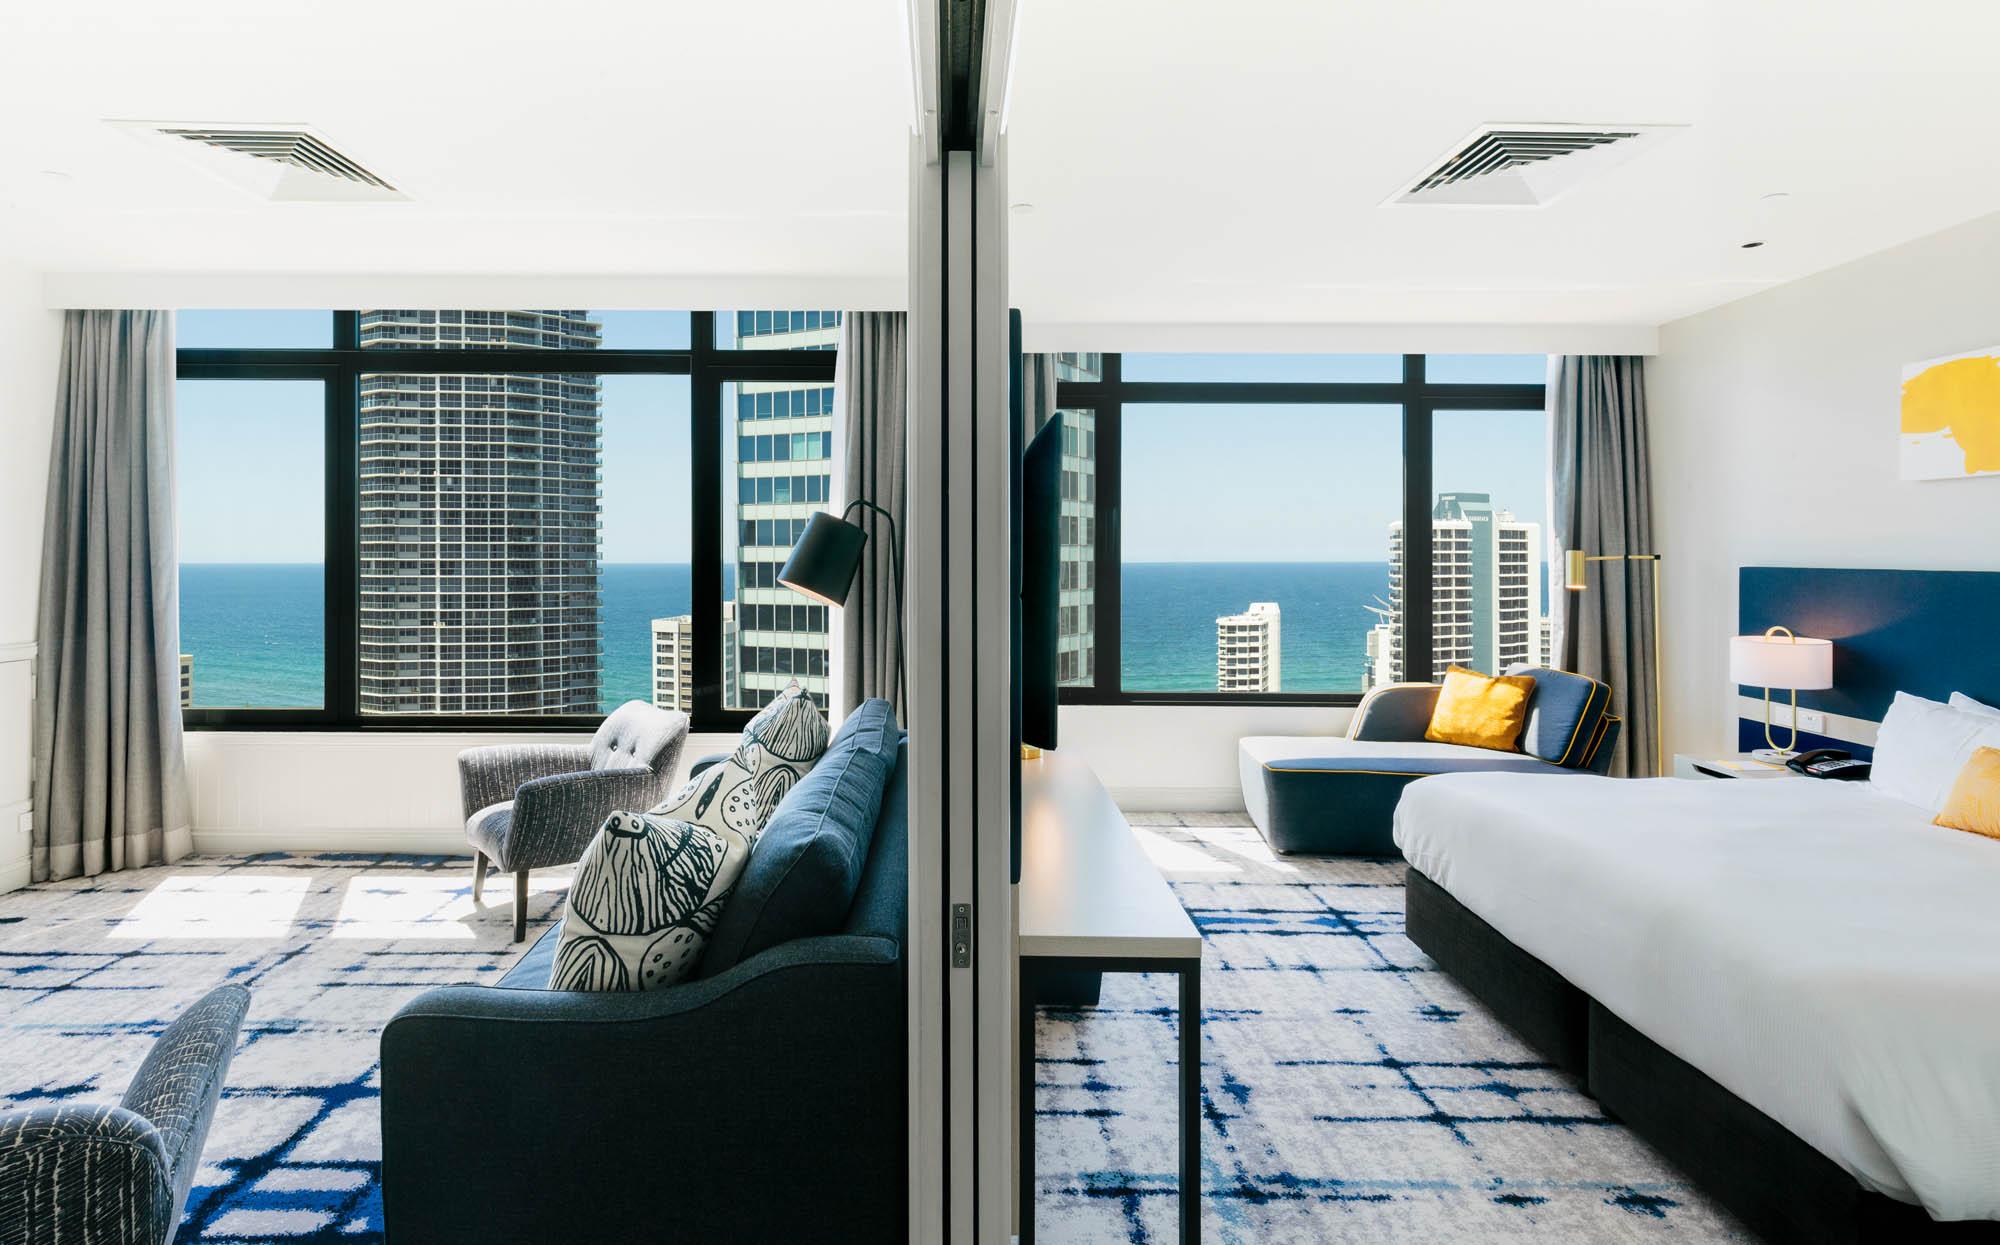 voco hotel gold coast fitout refurbishment construction executive suite studio bedroom loungeroom